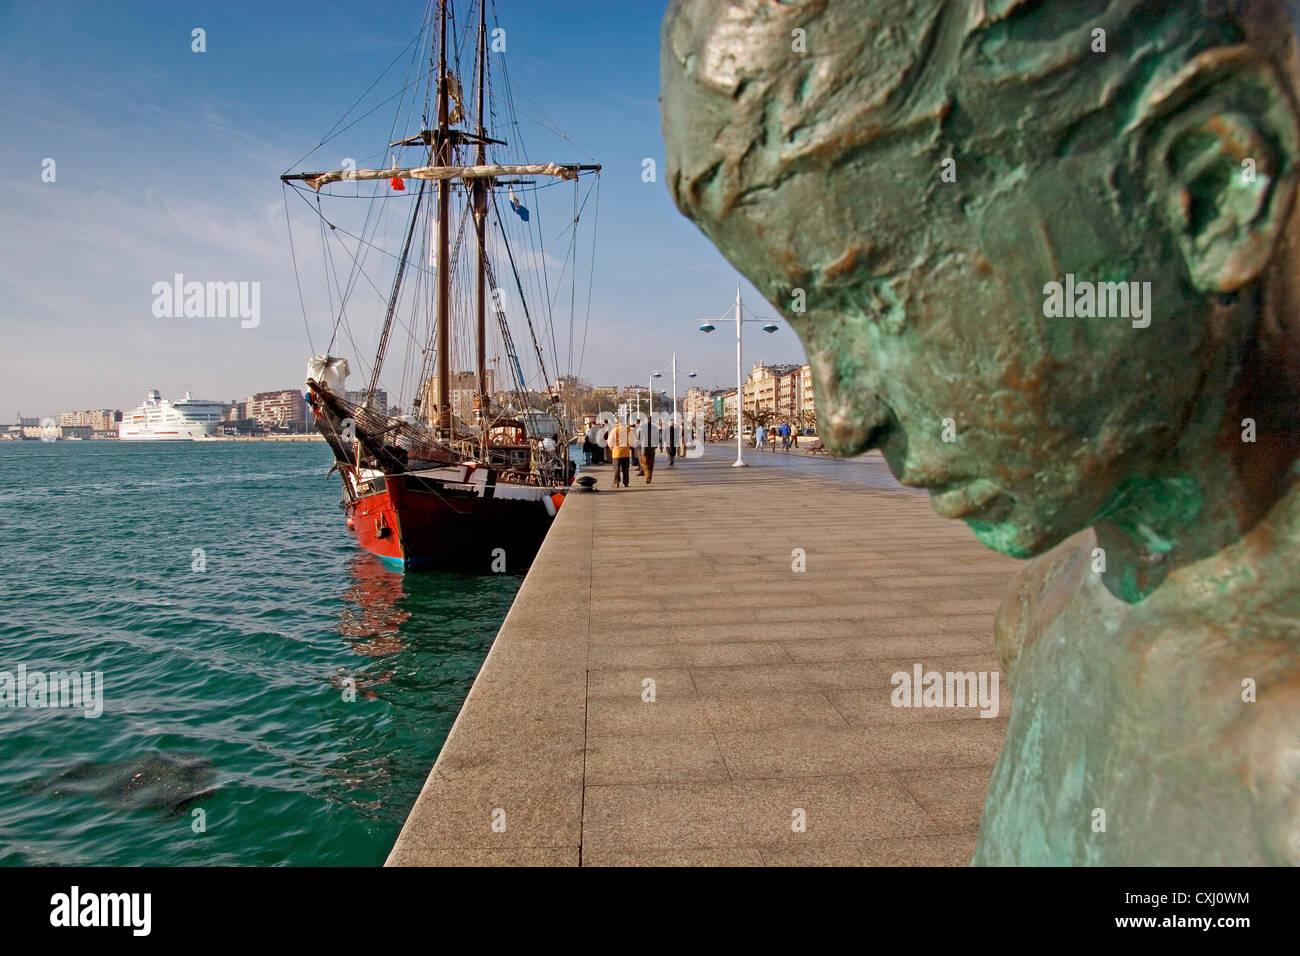 monument to Raqueros schooner and Brittany Ferries Santander Cantabria Spain monumento los raqueros españa - Stock Image